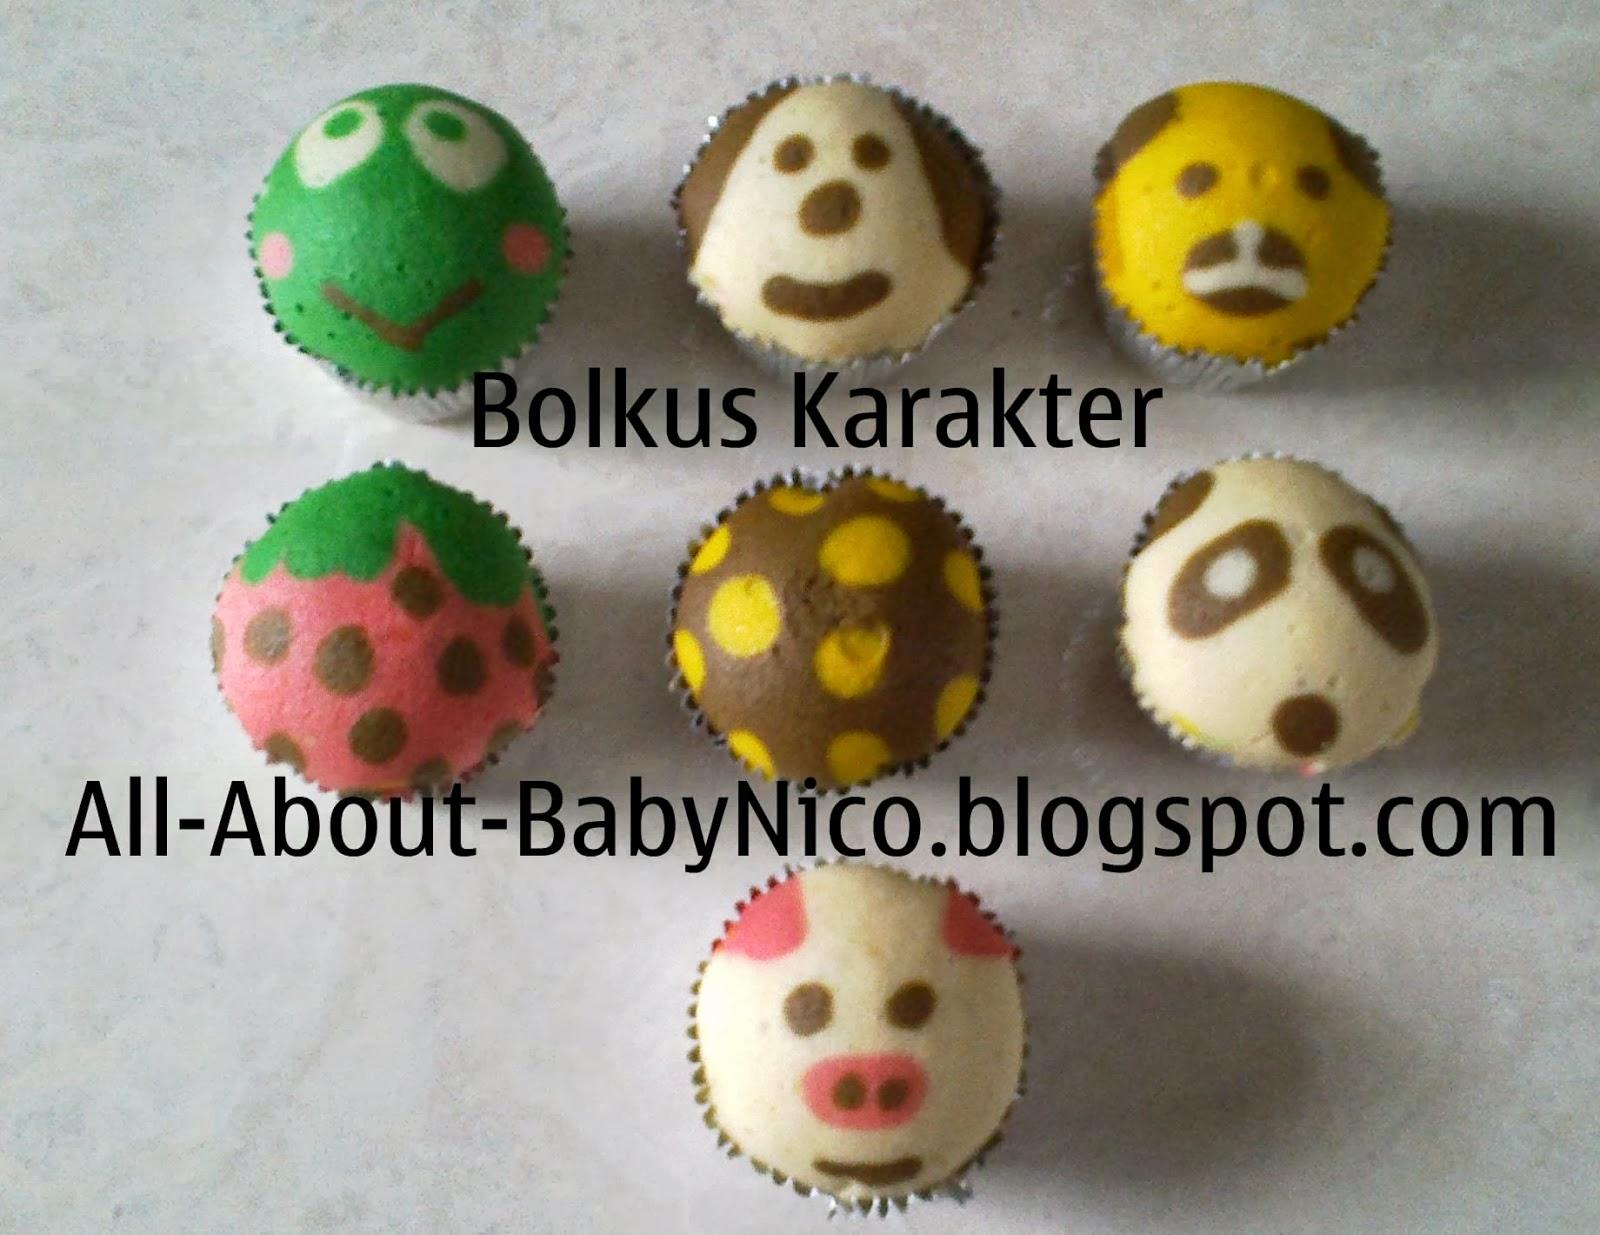 All About Baby Nico: Bolu Kukus Karakter (Bolu Kukus Gundul)